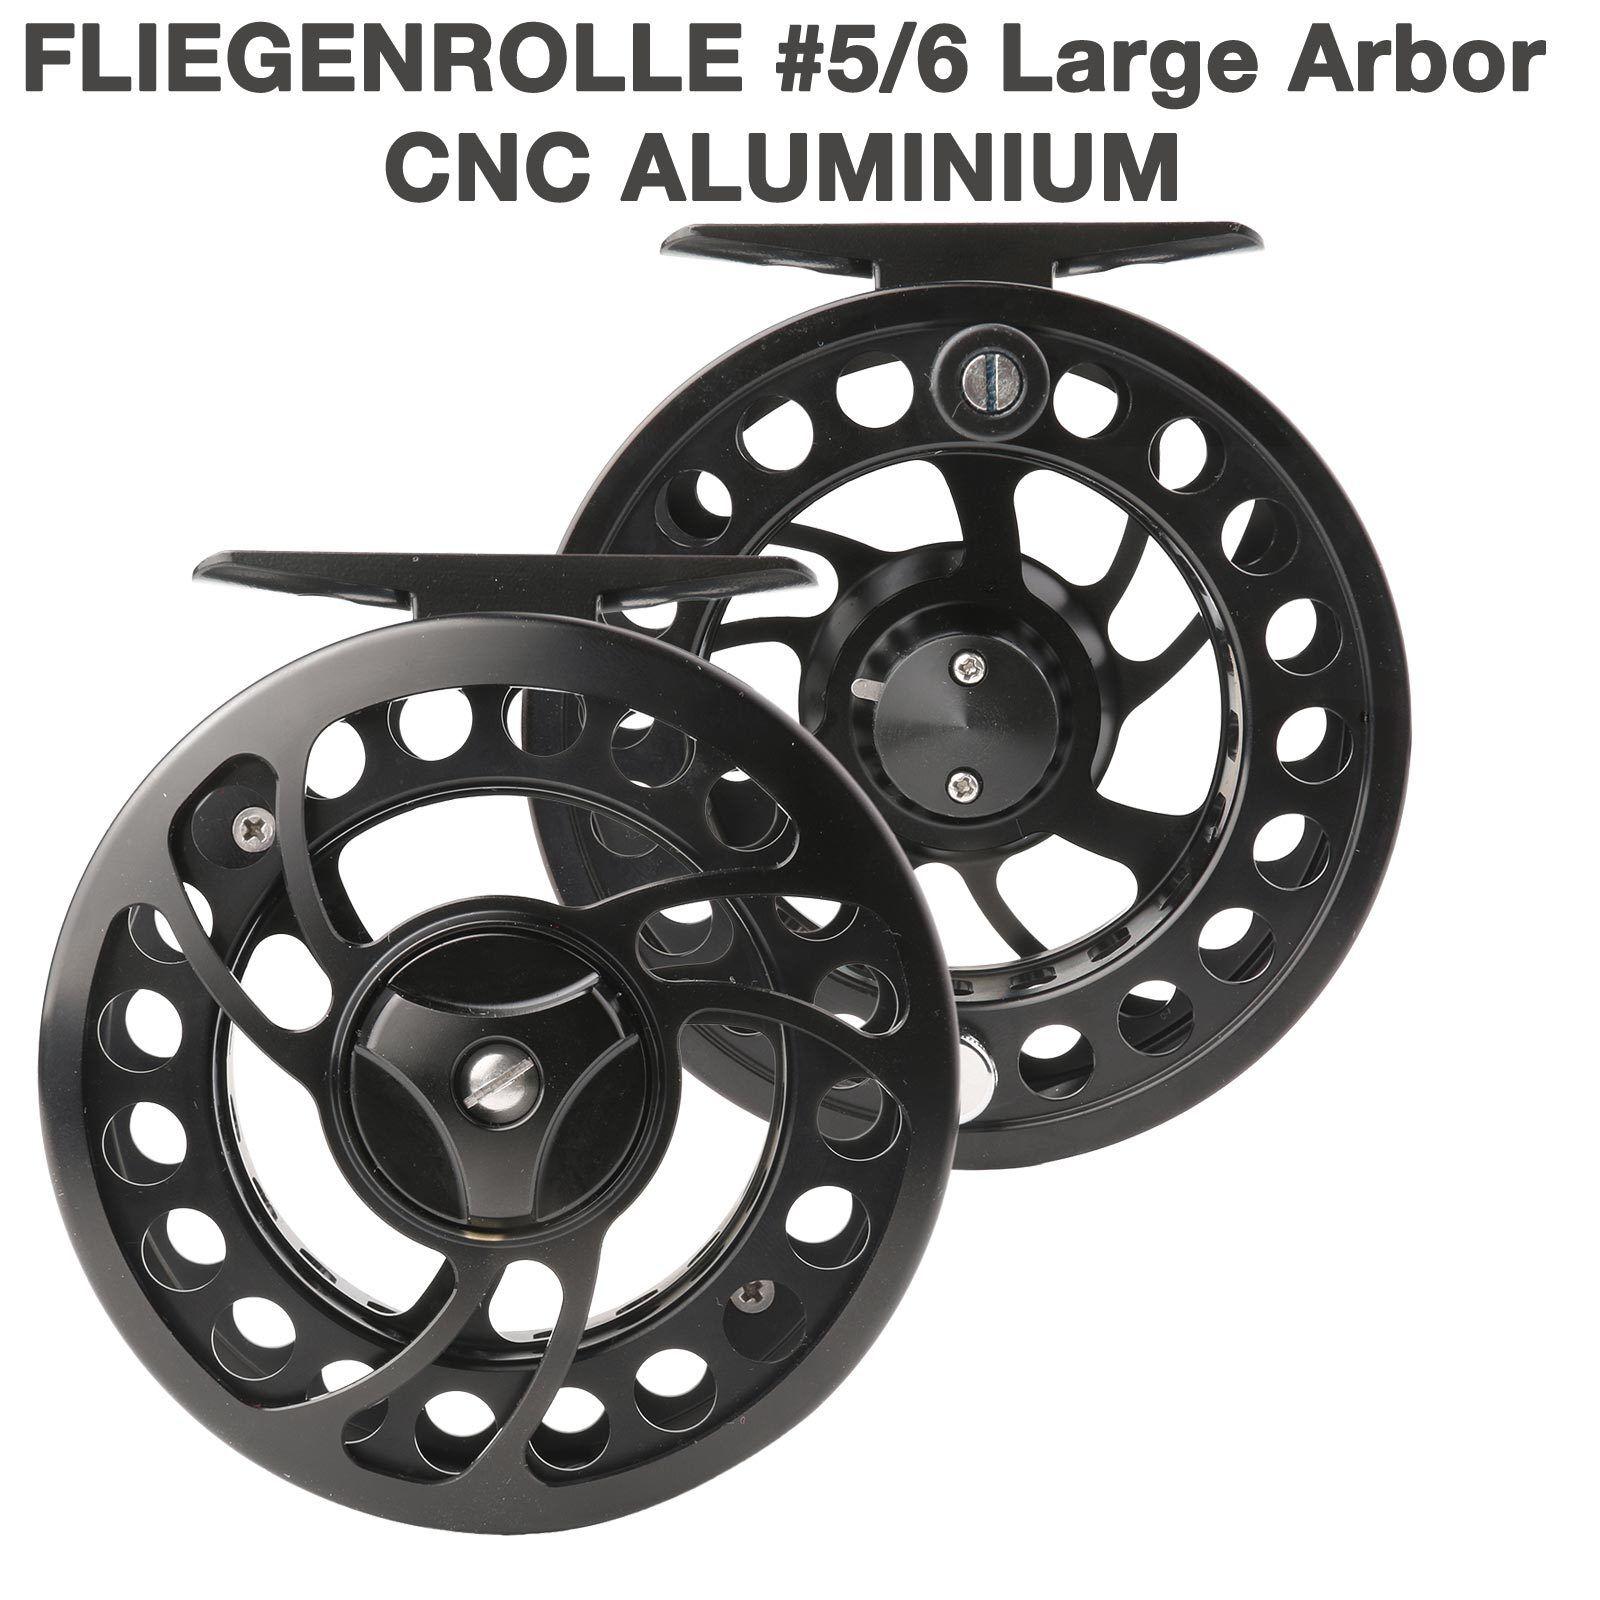 Fliegenrolle ML 5/6 Fly Reel Fliegenfischen Angelrolle Aluminium CNC Large Arbor